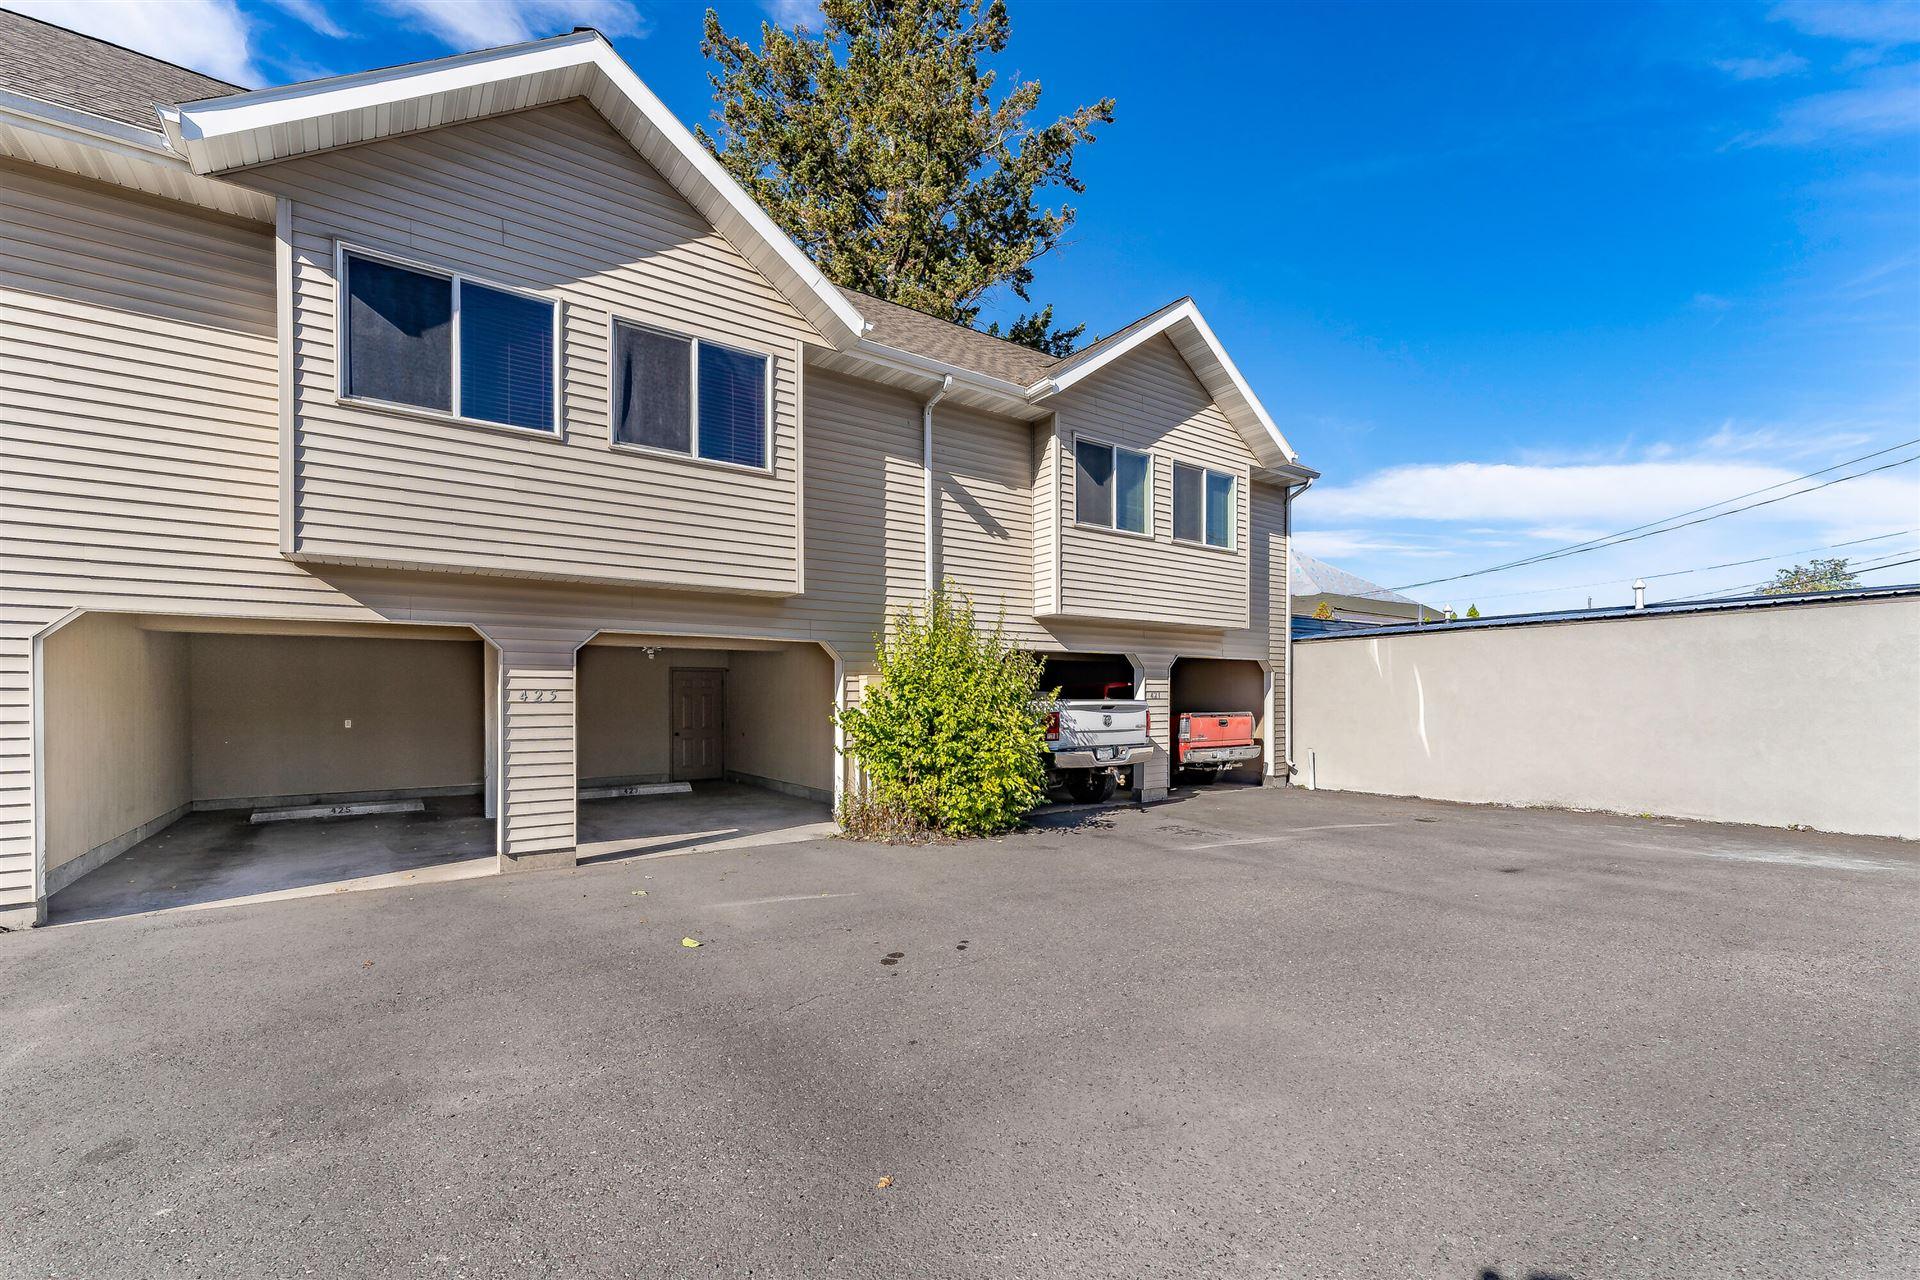 Photo of 423 & 425 2nd Avenue West, Kalispell, MT 59901 (MLS # 22115748)